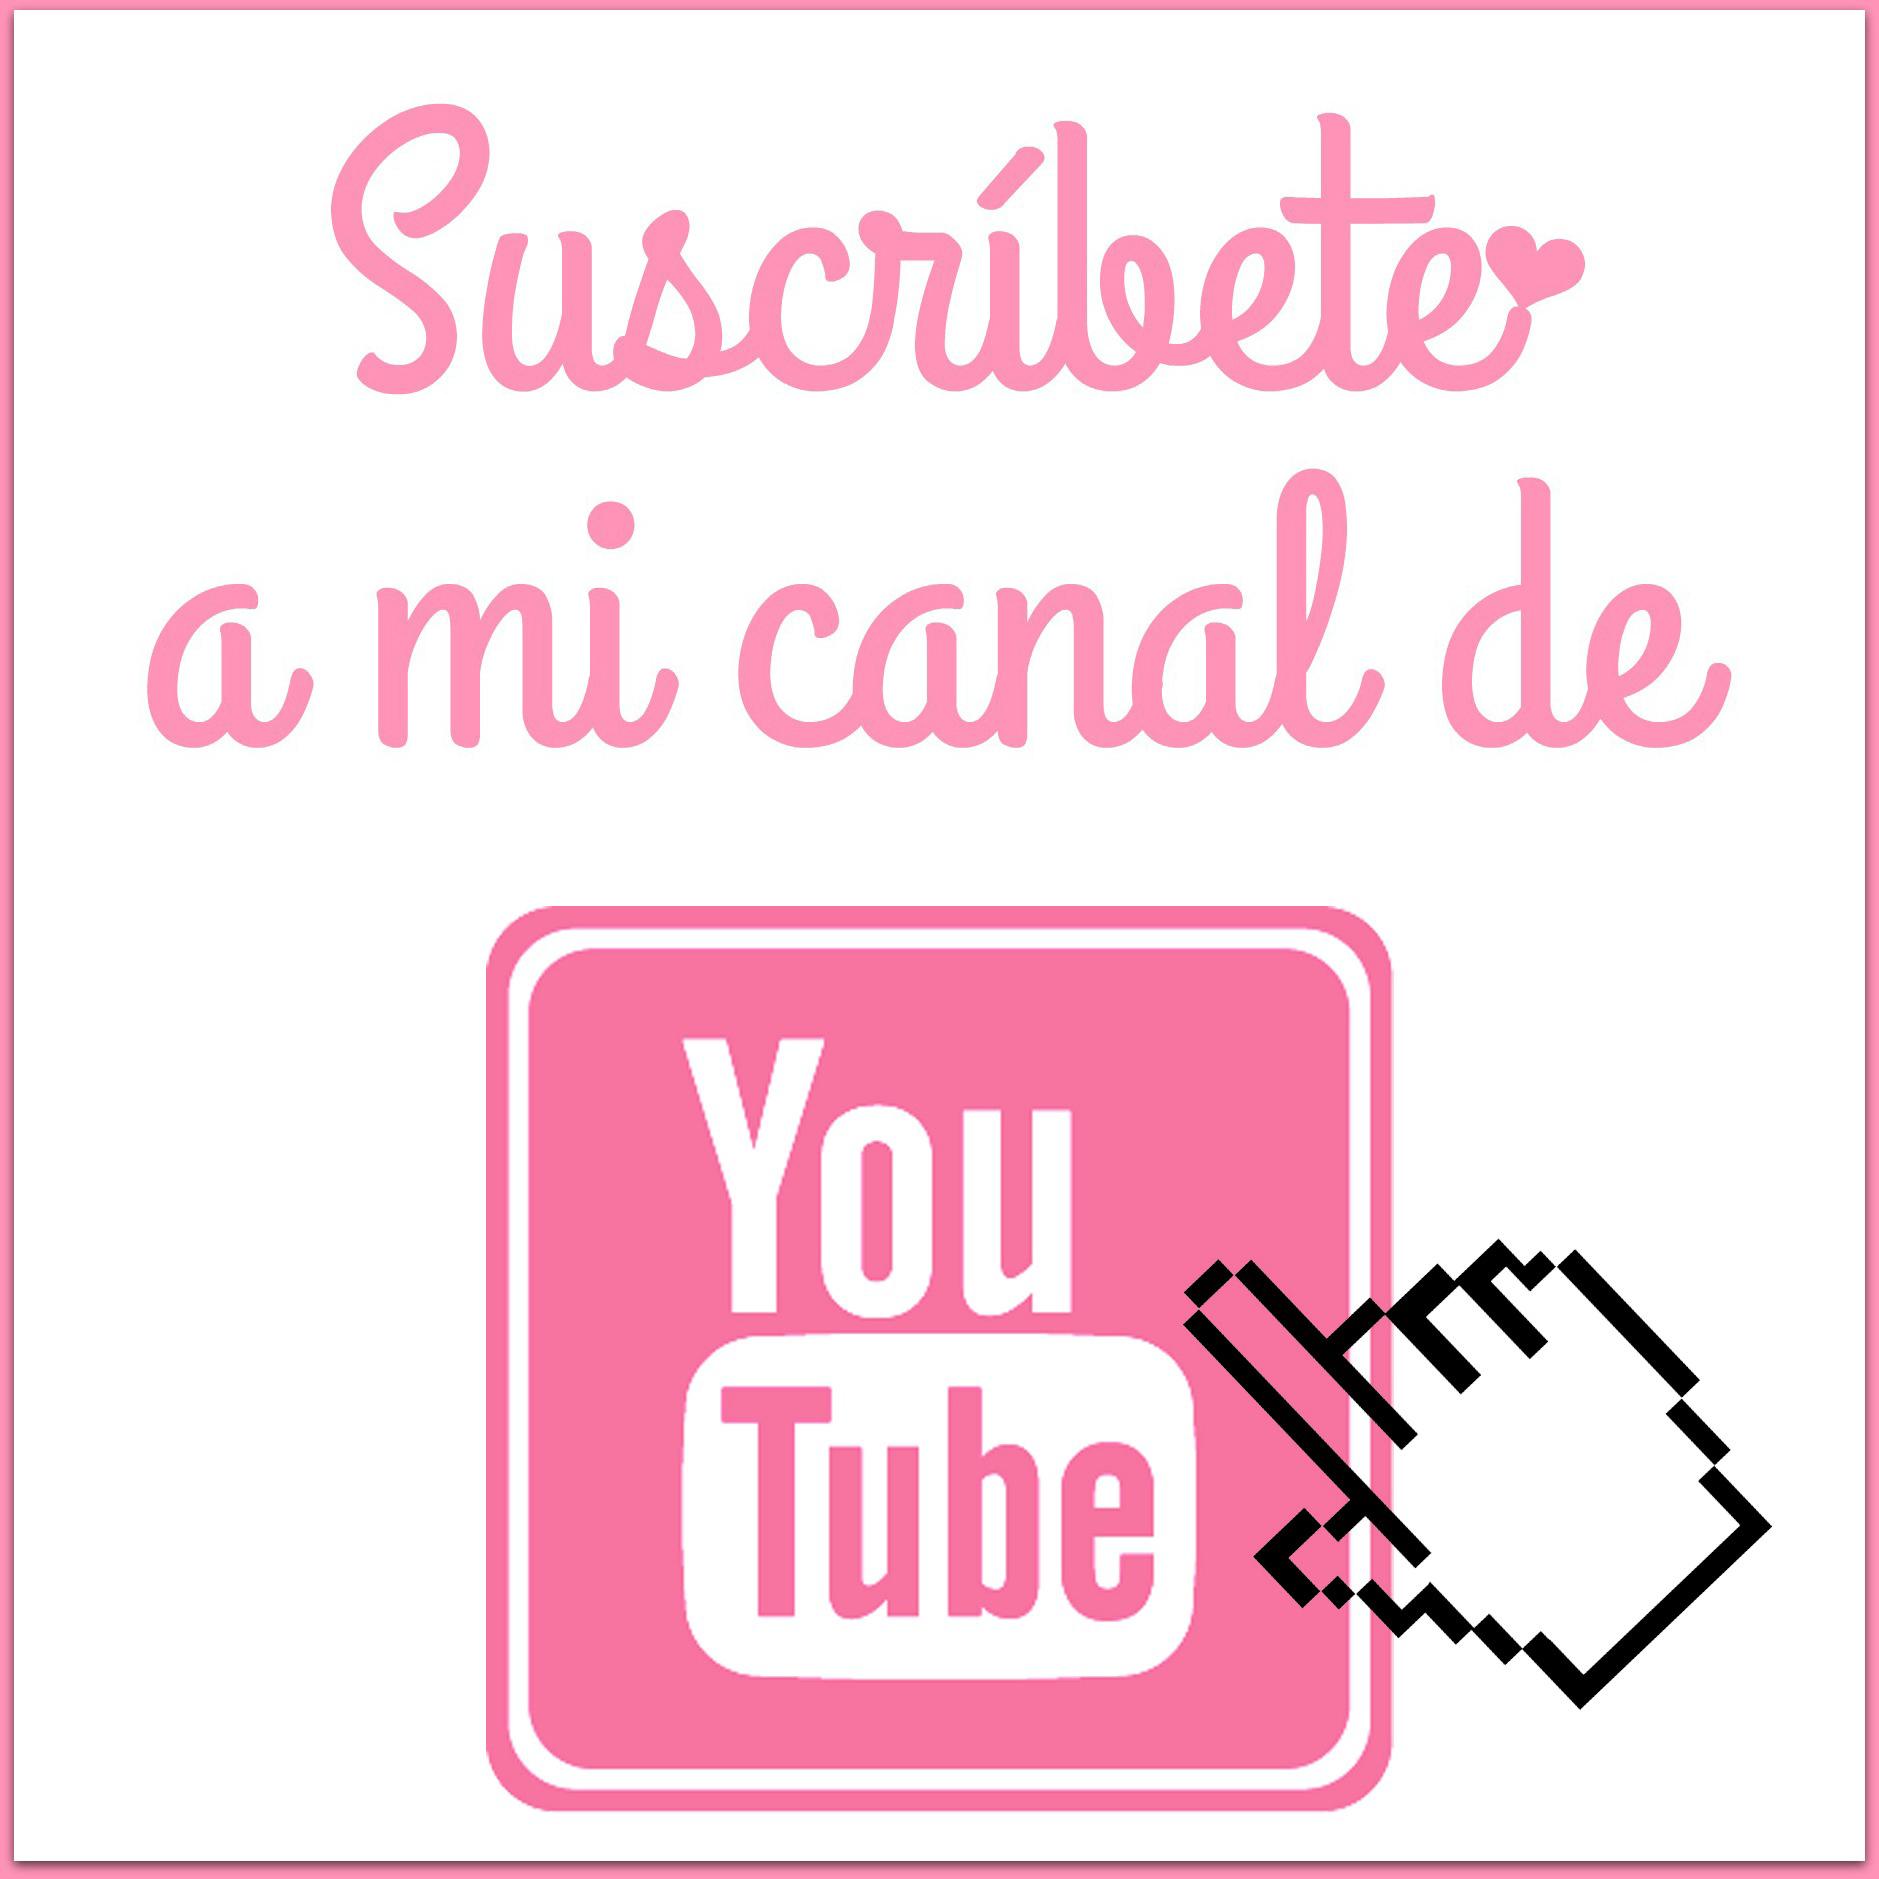 Suscríbete a mi Canal de Youtube!